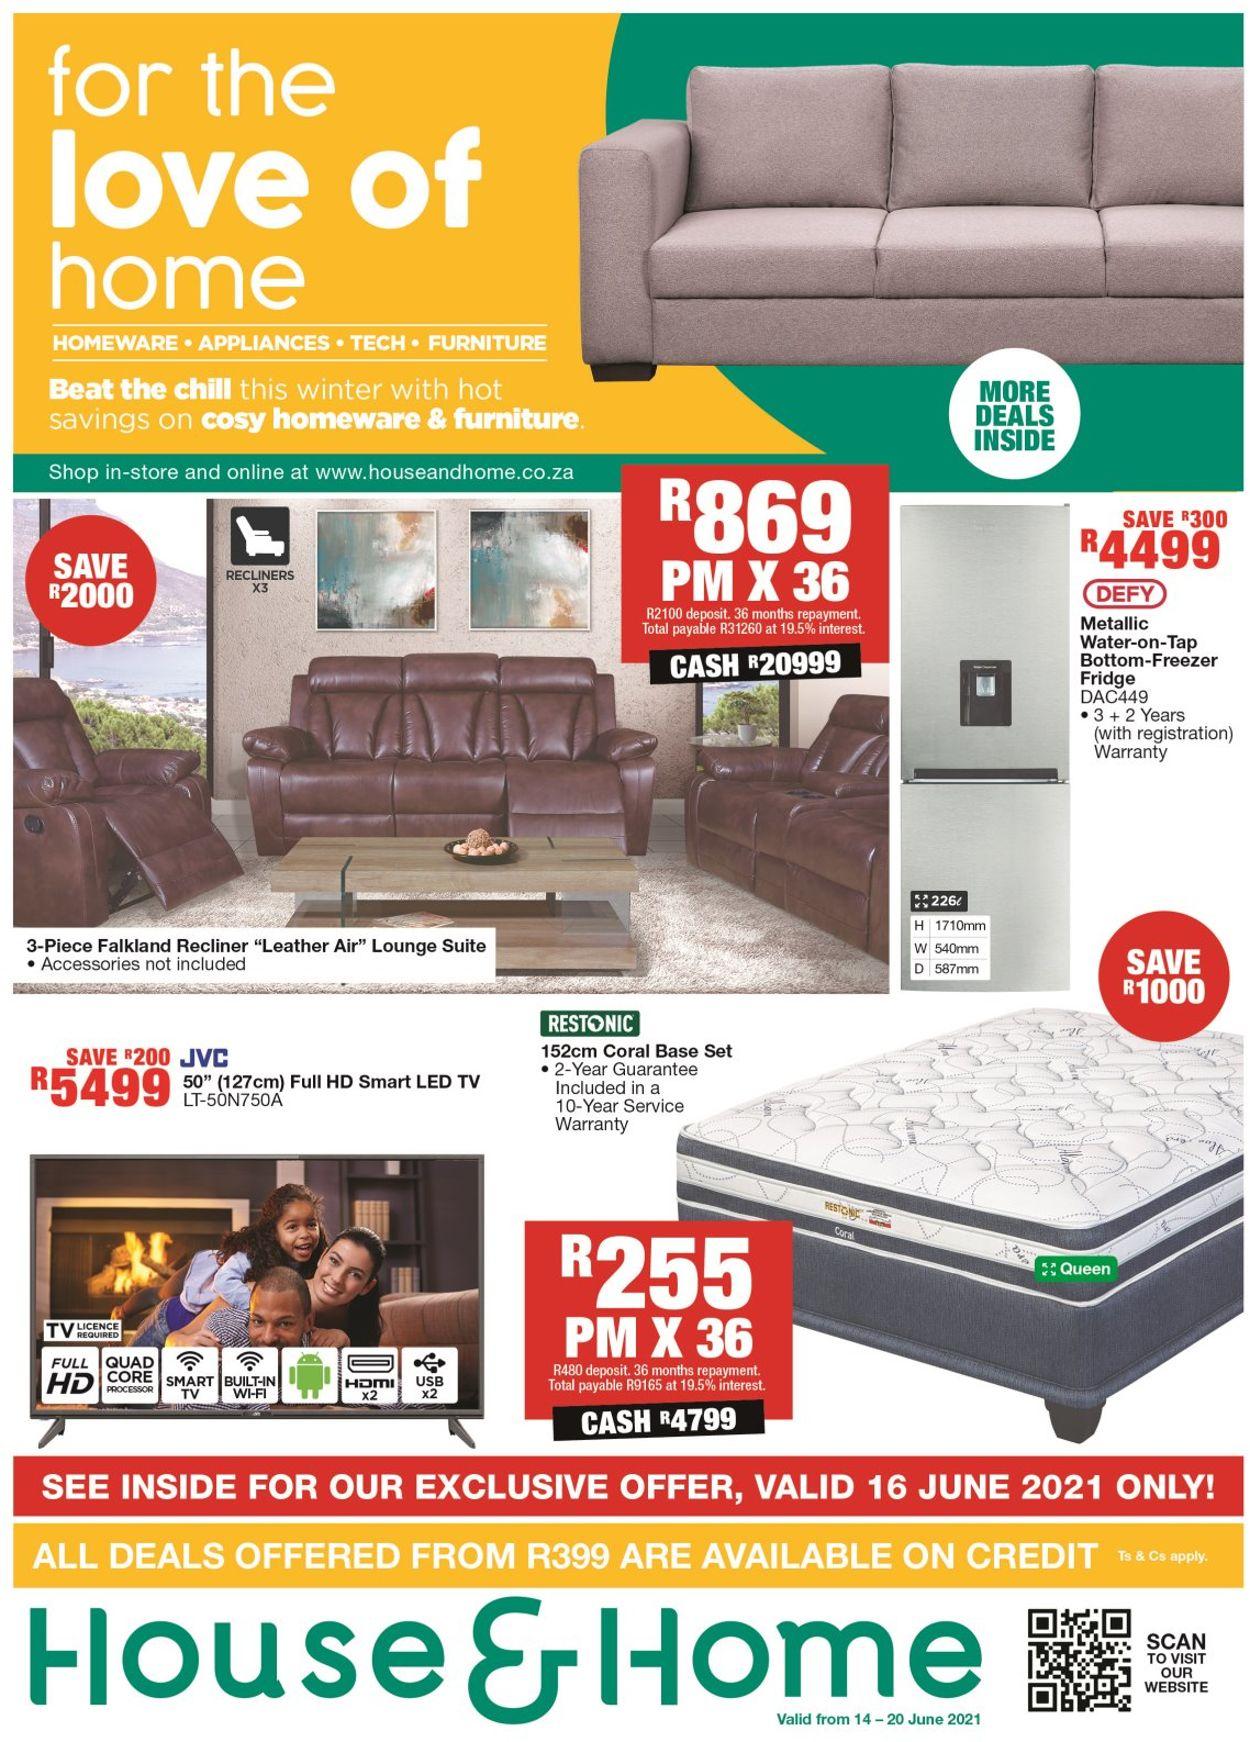 House & Home Catalogue - 2021/06/14-2021/06/20